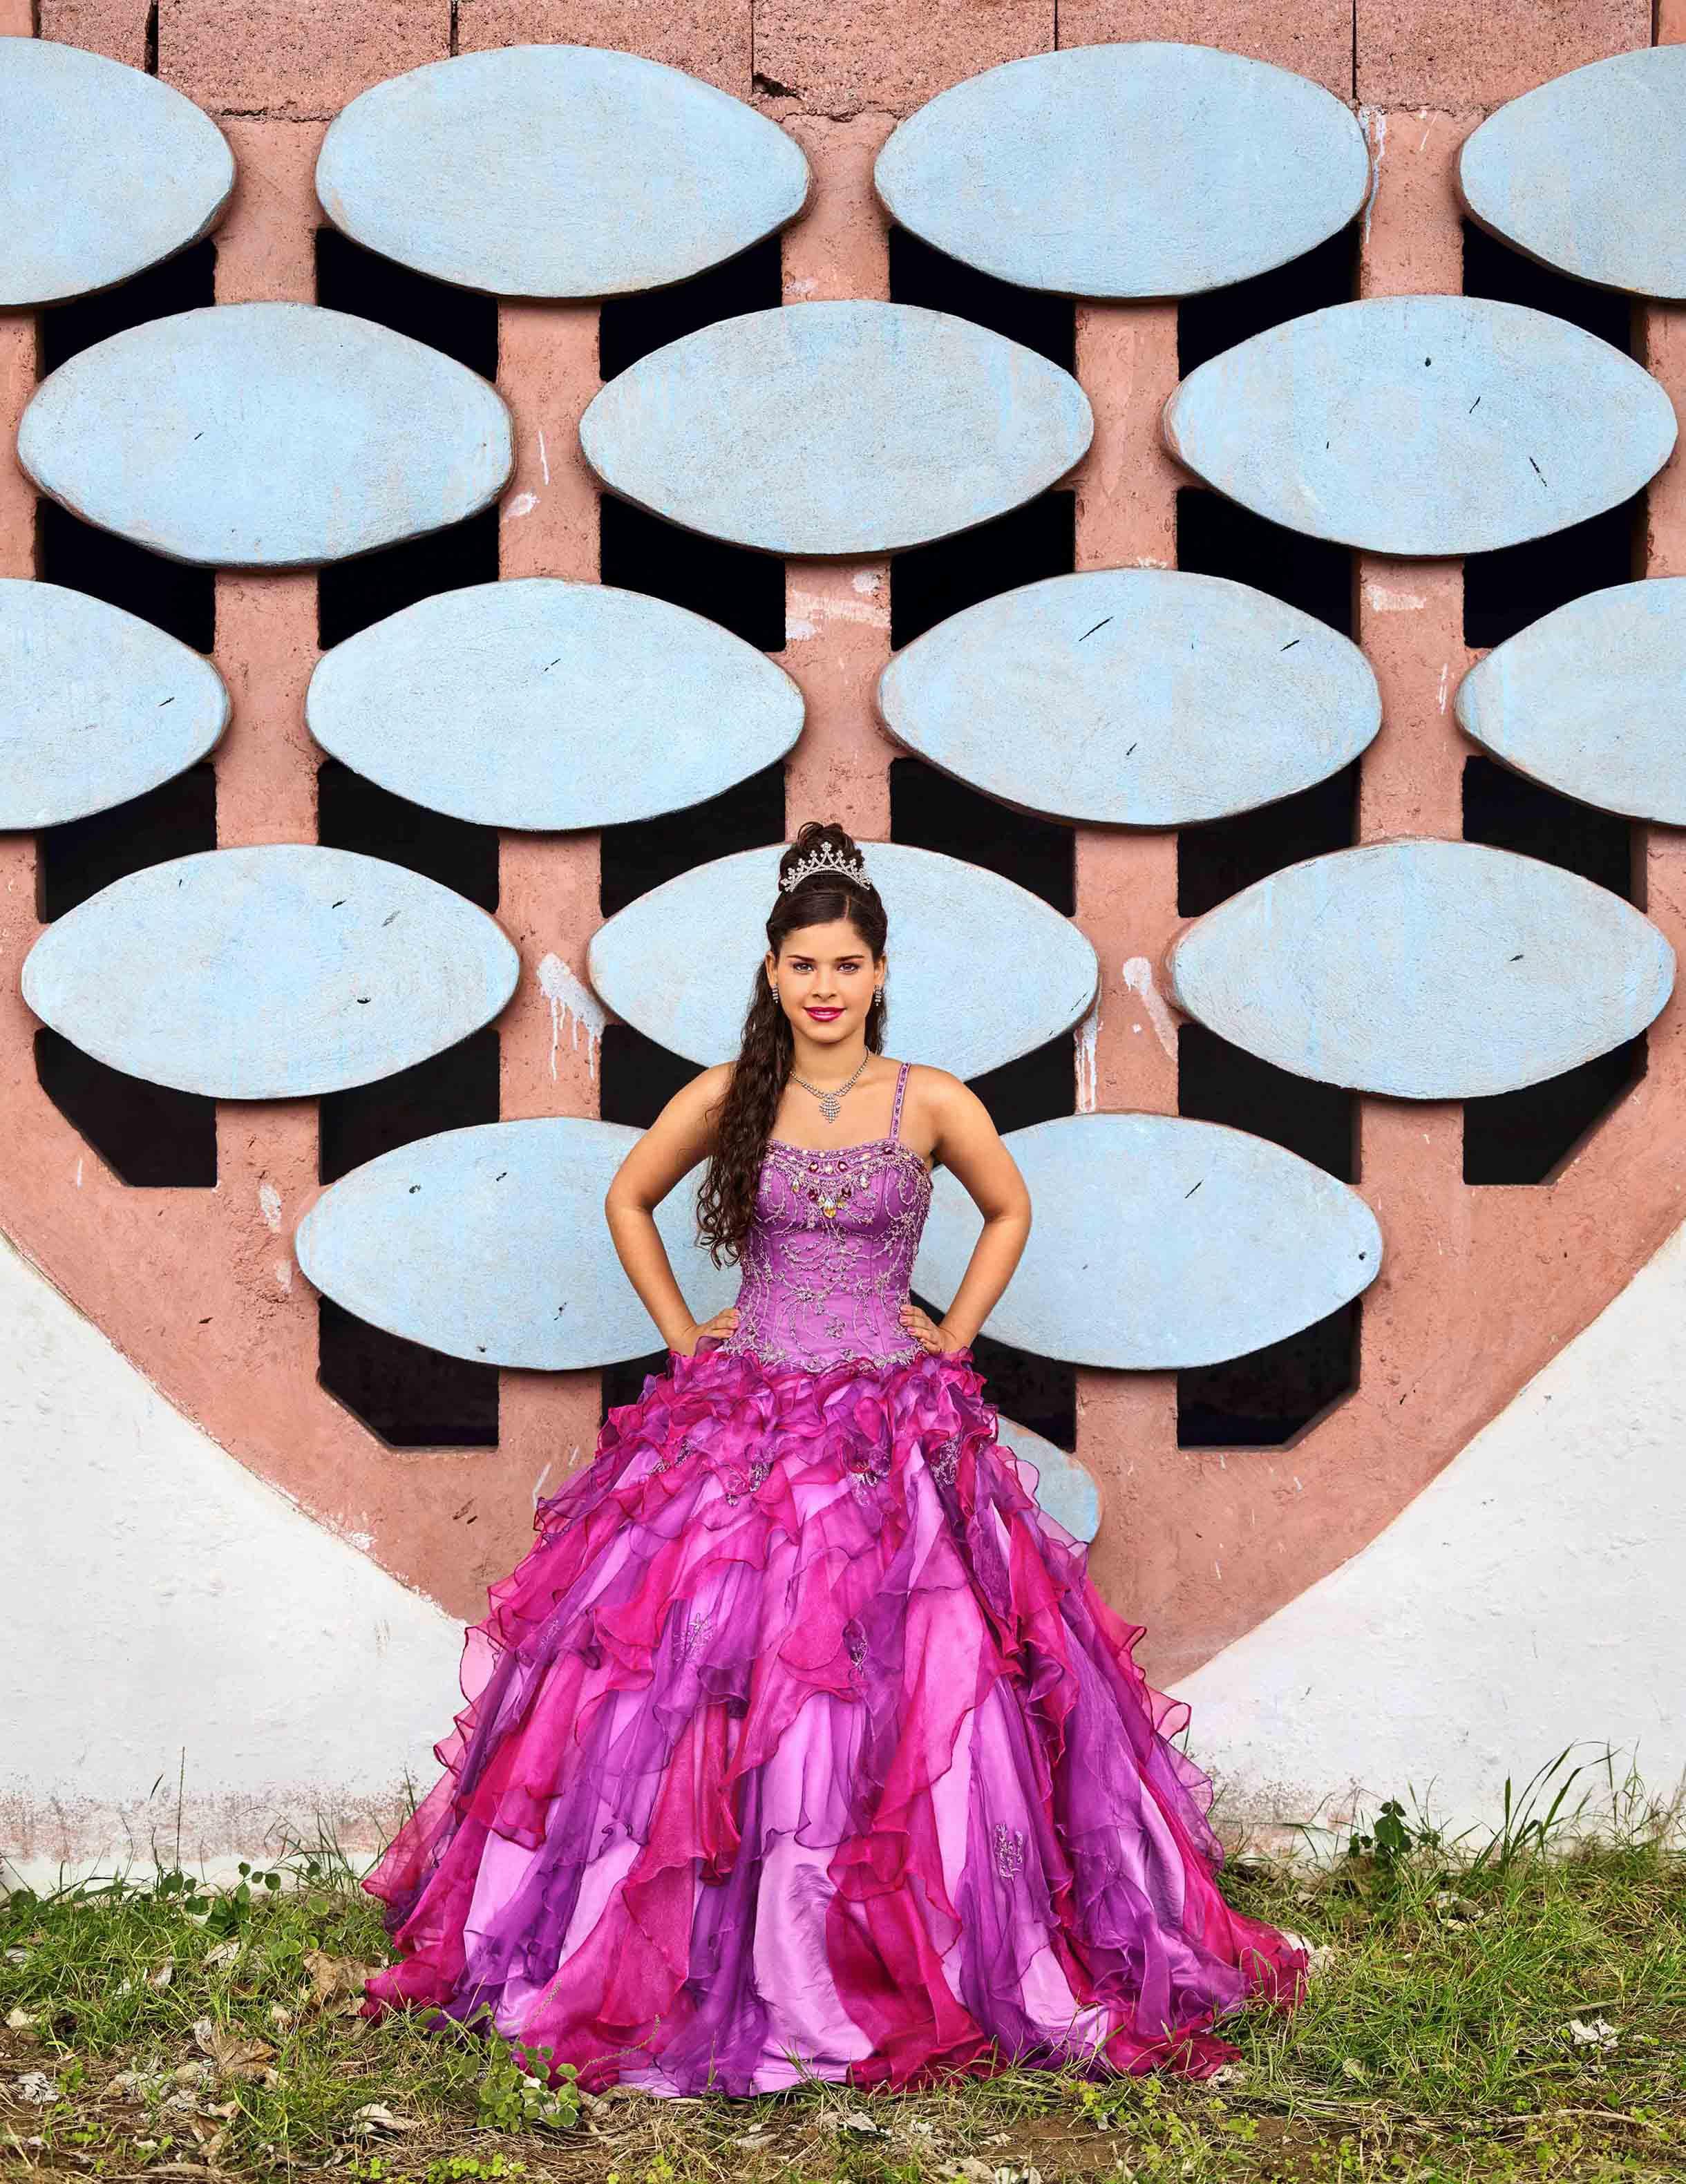 Frank Thiel,Aurora Flechilla Sobrino, La Habana, Habana del Este, Cojímar, Estadio Panamericano, 2016, Courtesy the artist and BlainSouthern